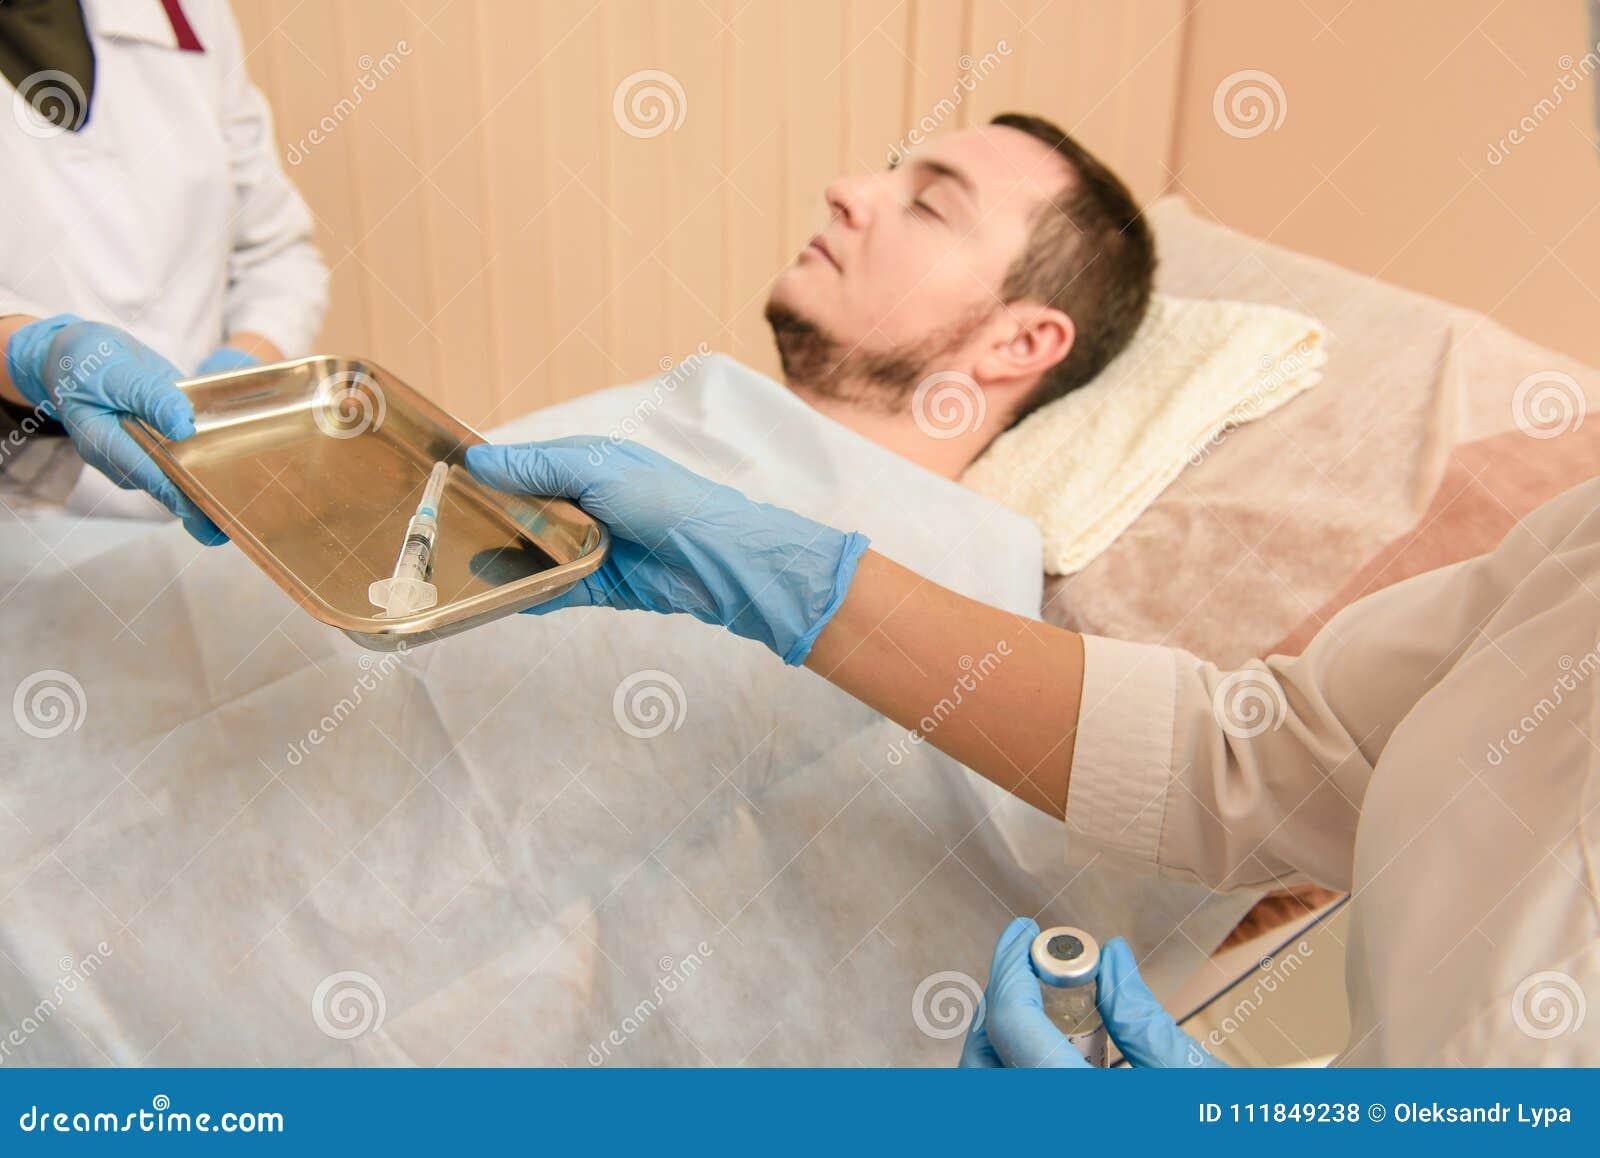 Medico prende una siringa